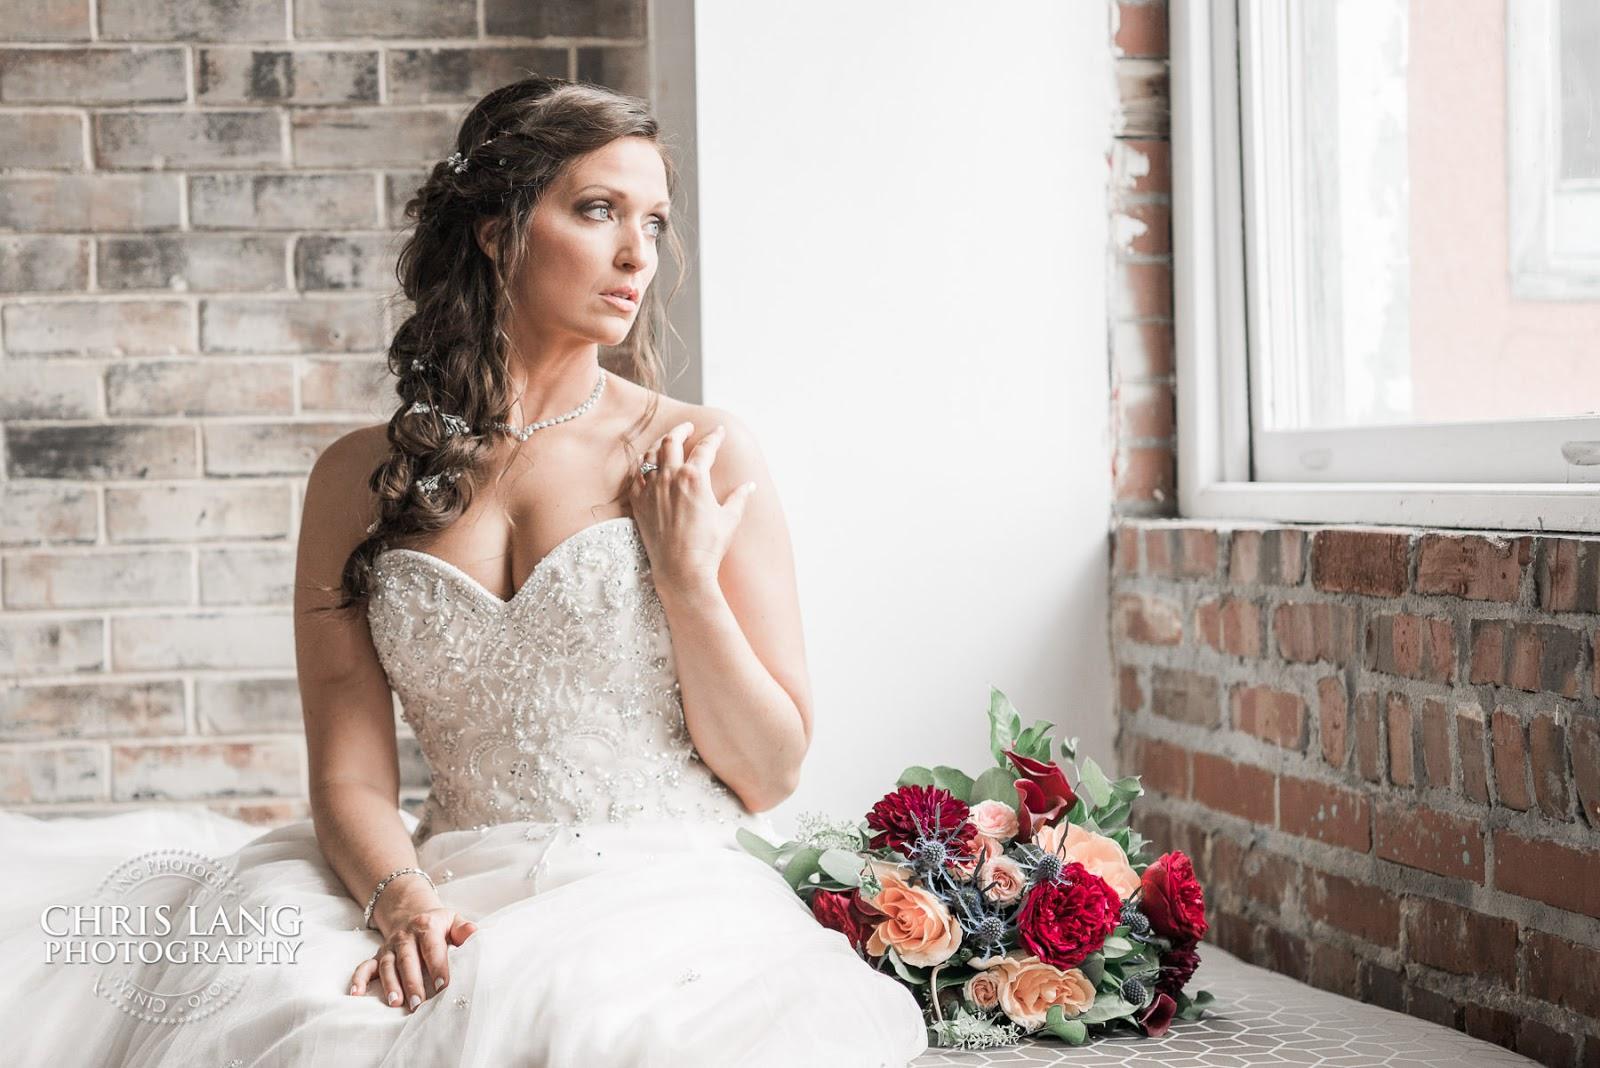 Lifestyle Weddings Blog